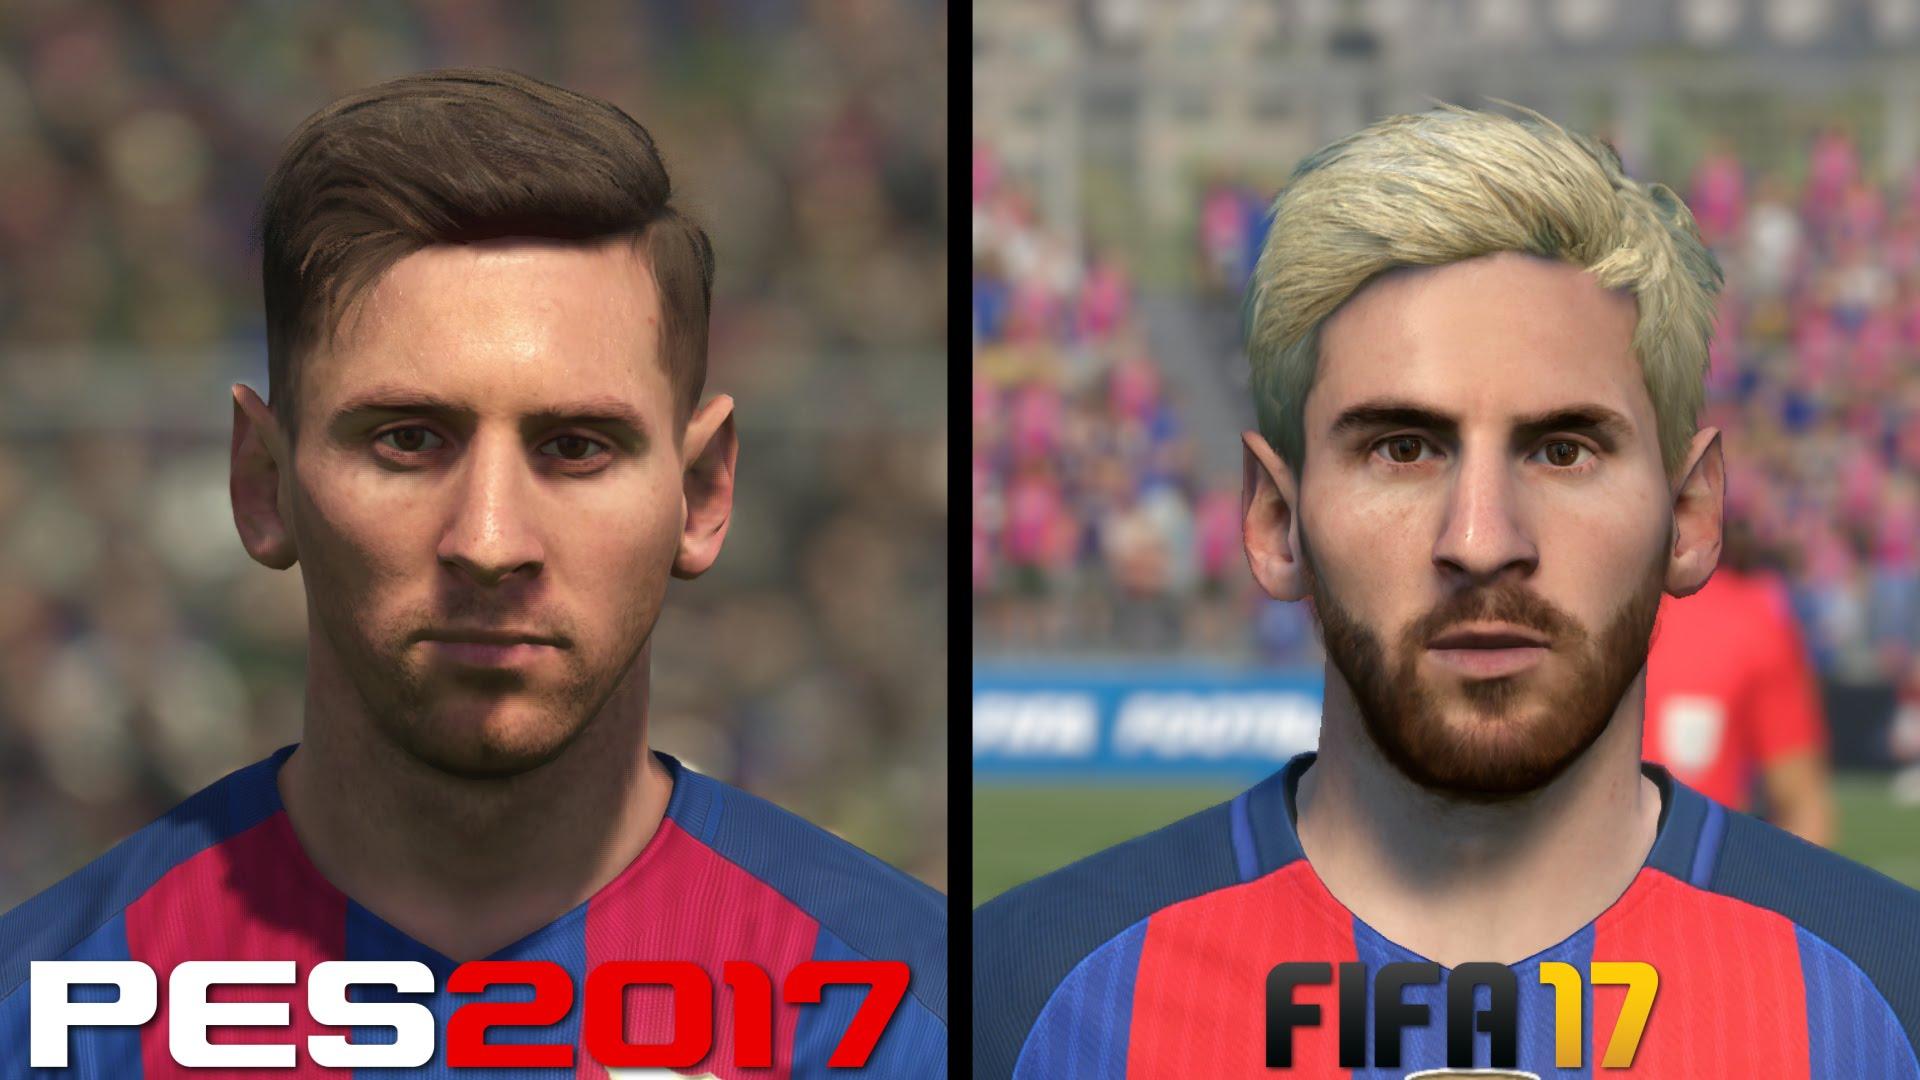 FIFA V PES